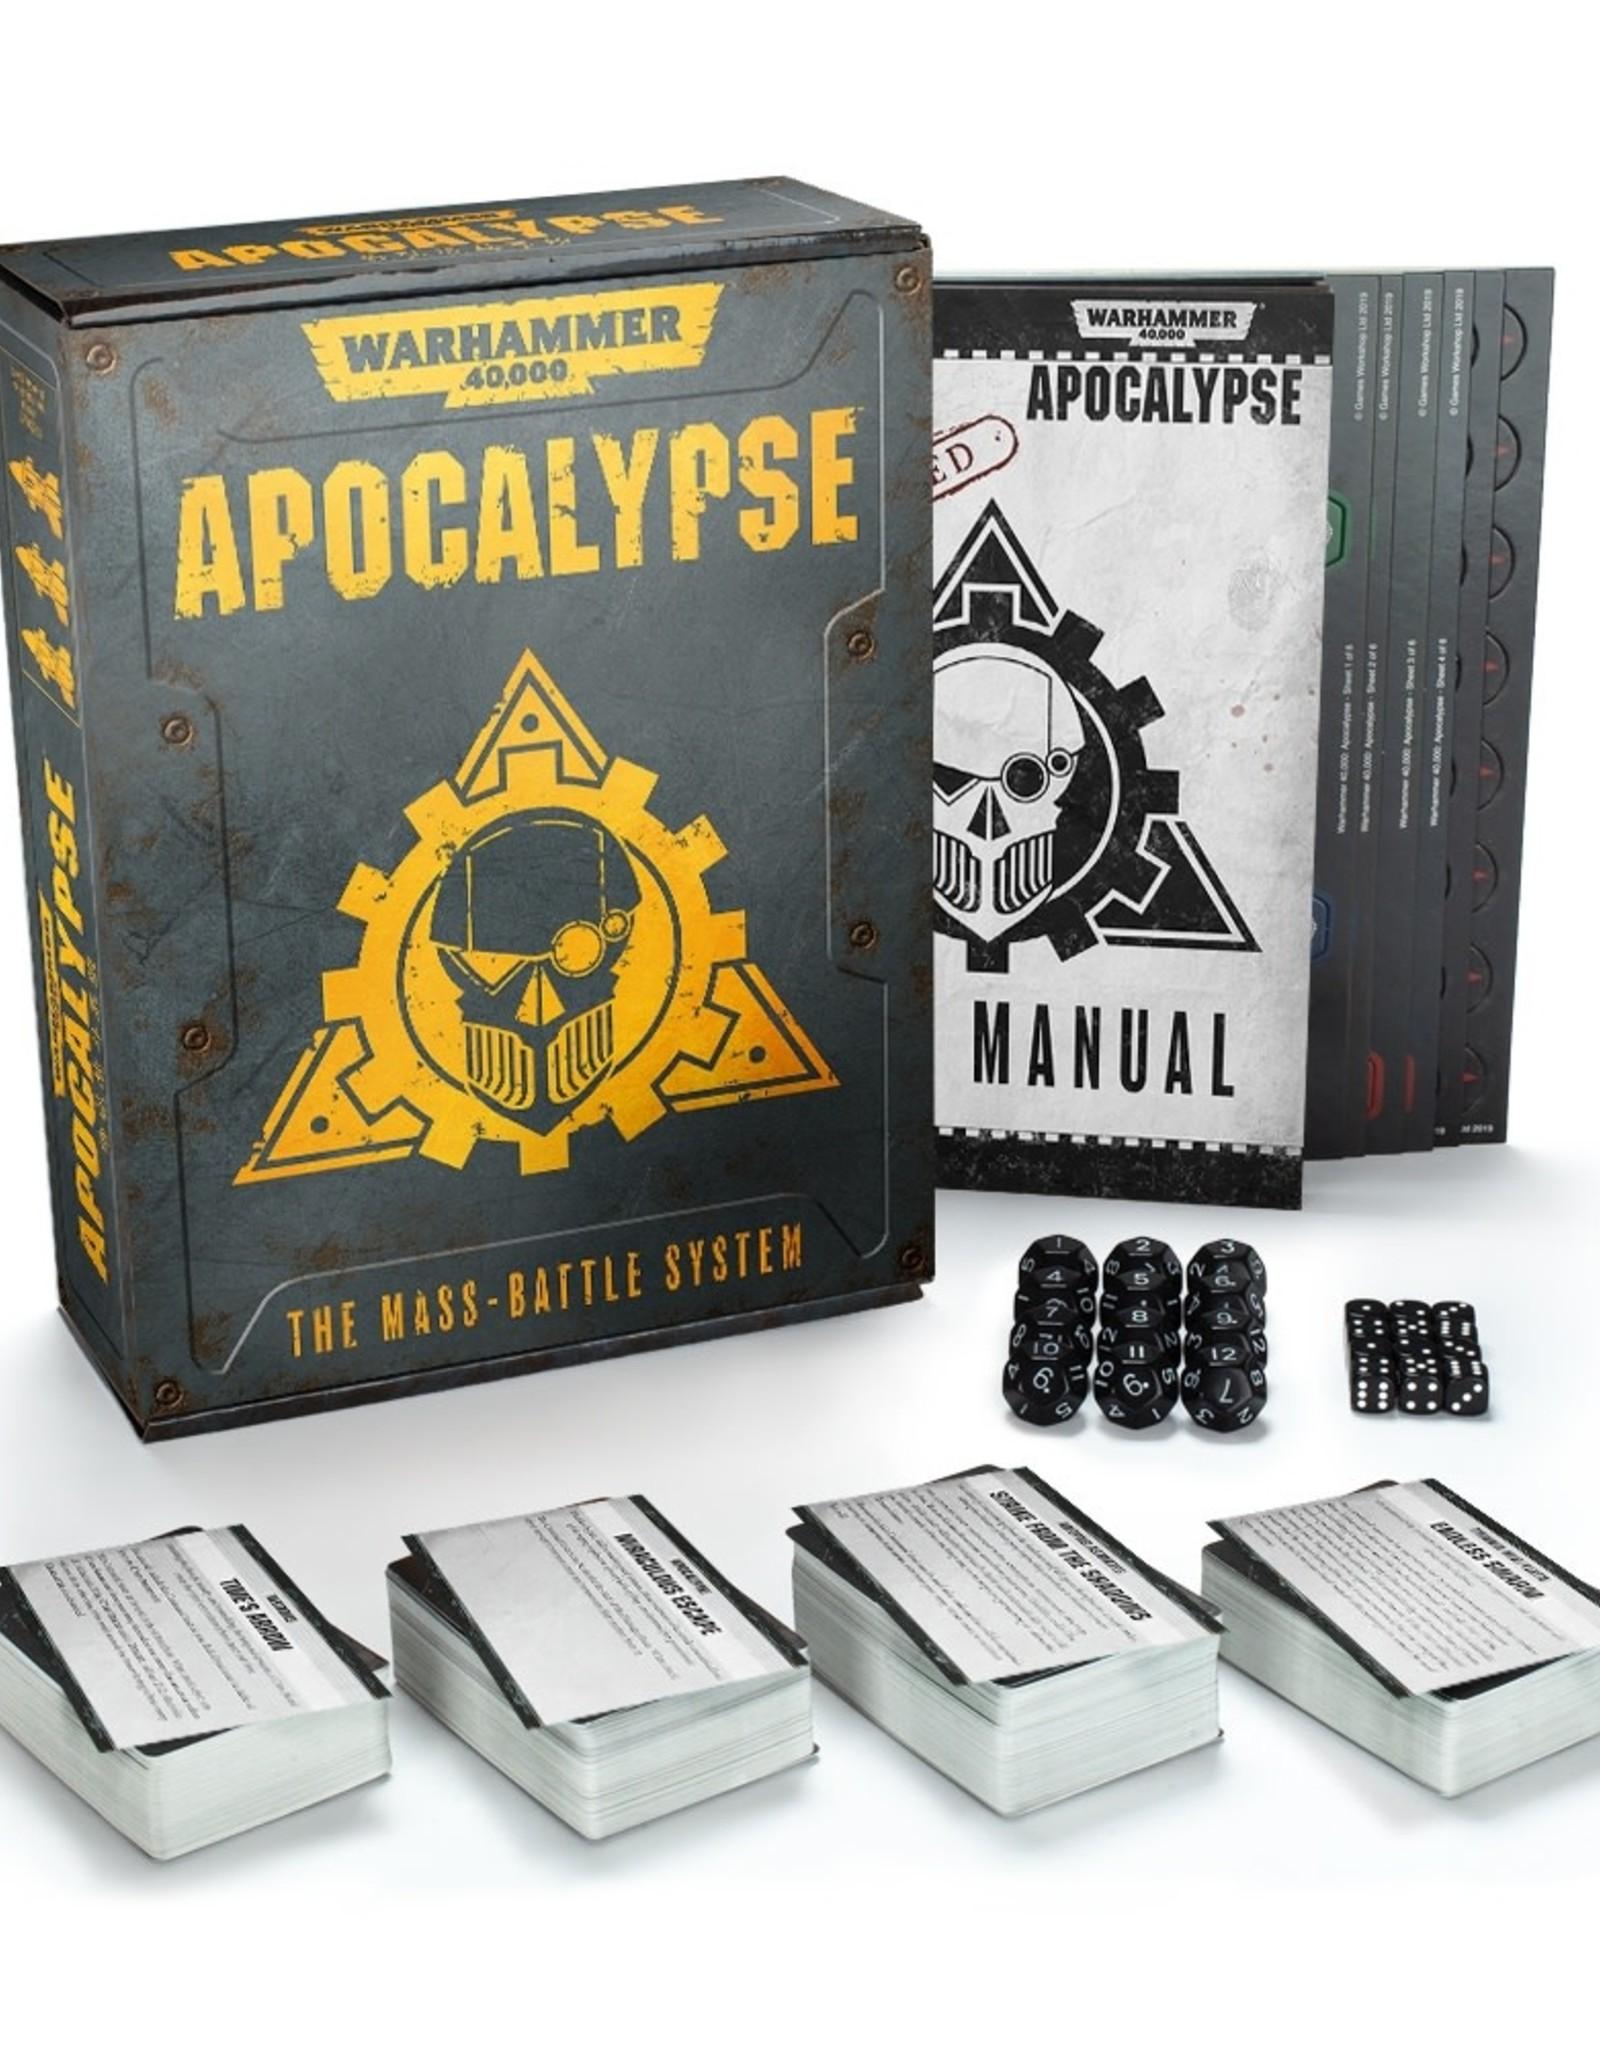 Warhammer 40K Apocalypse System